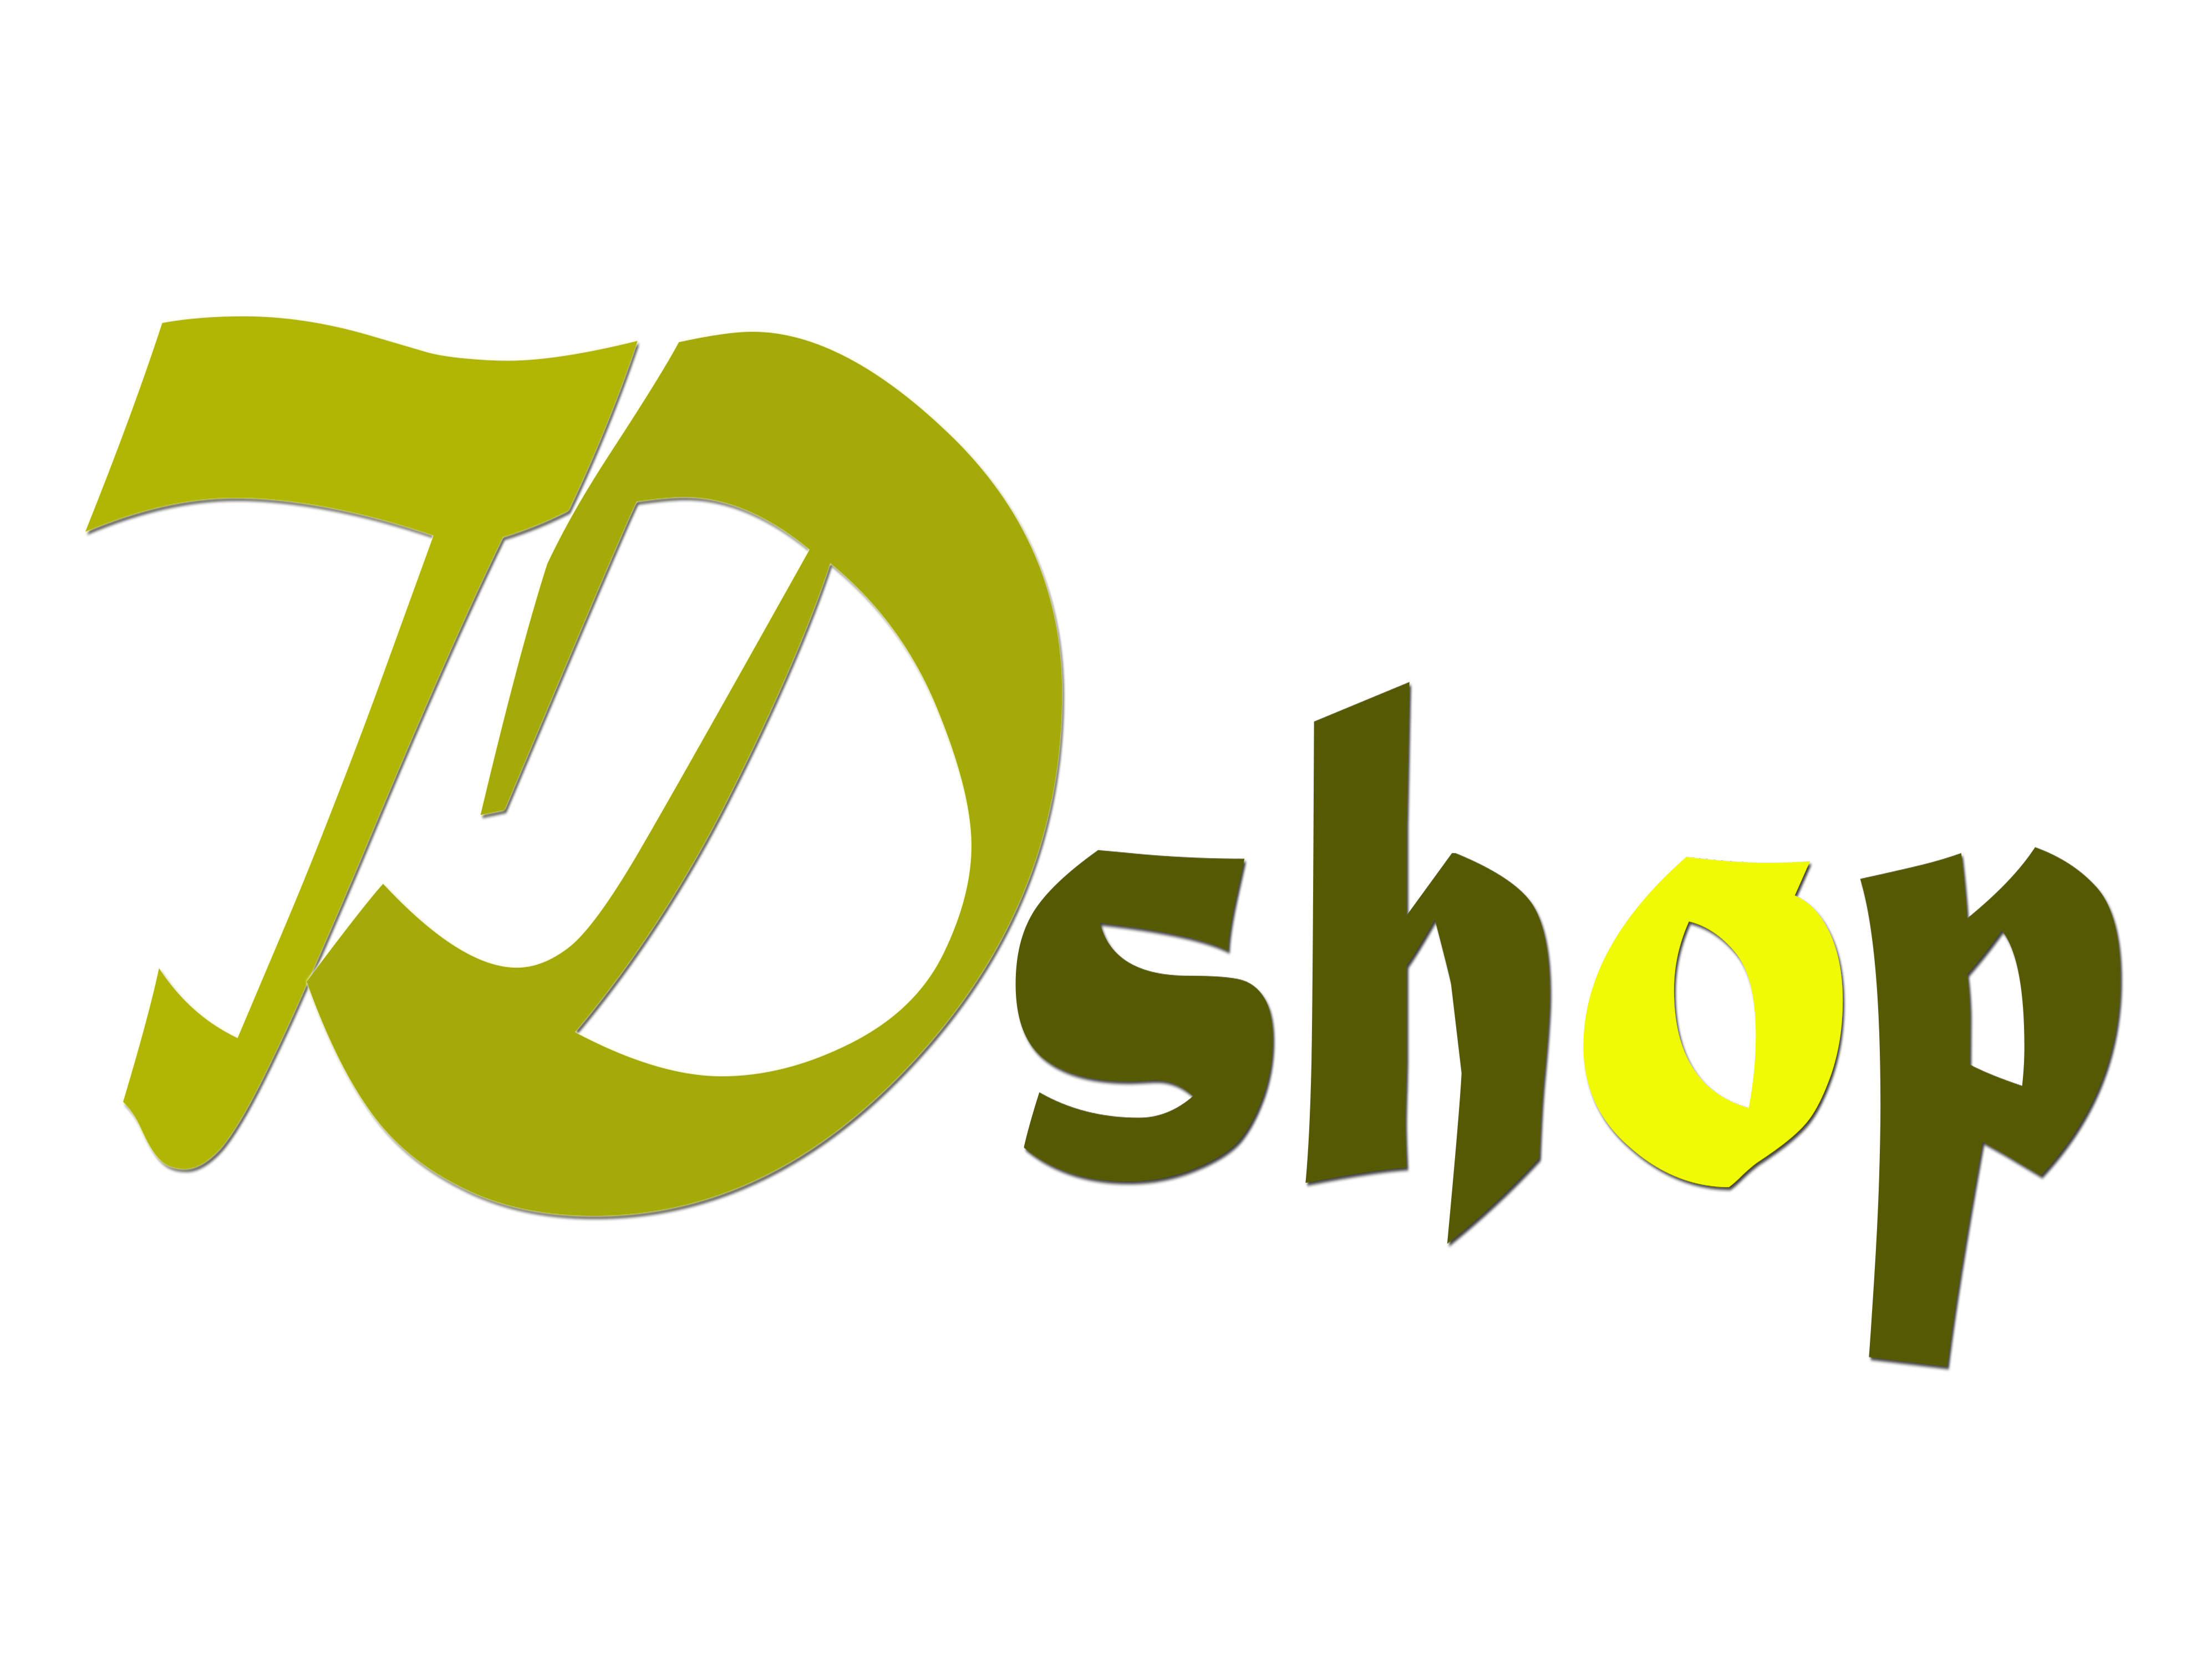 TD Shop